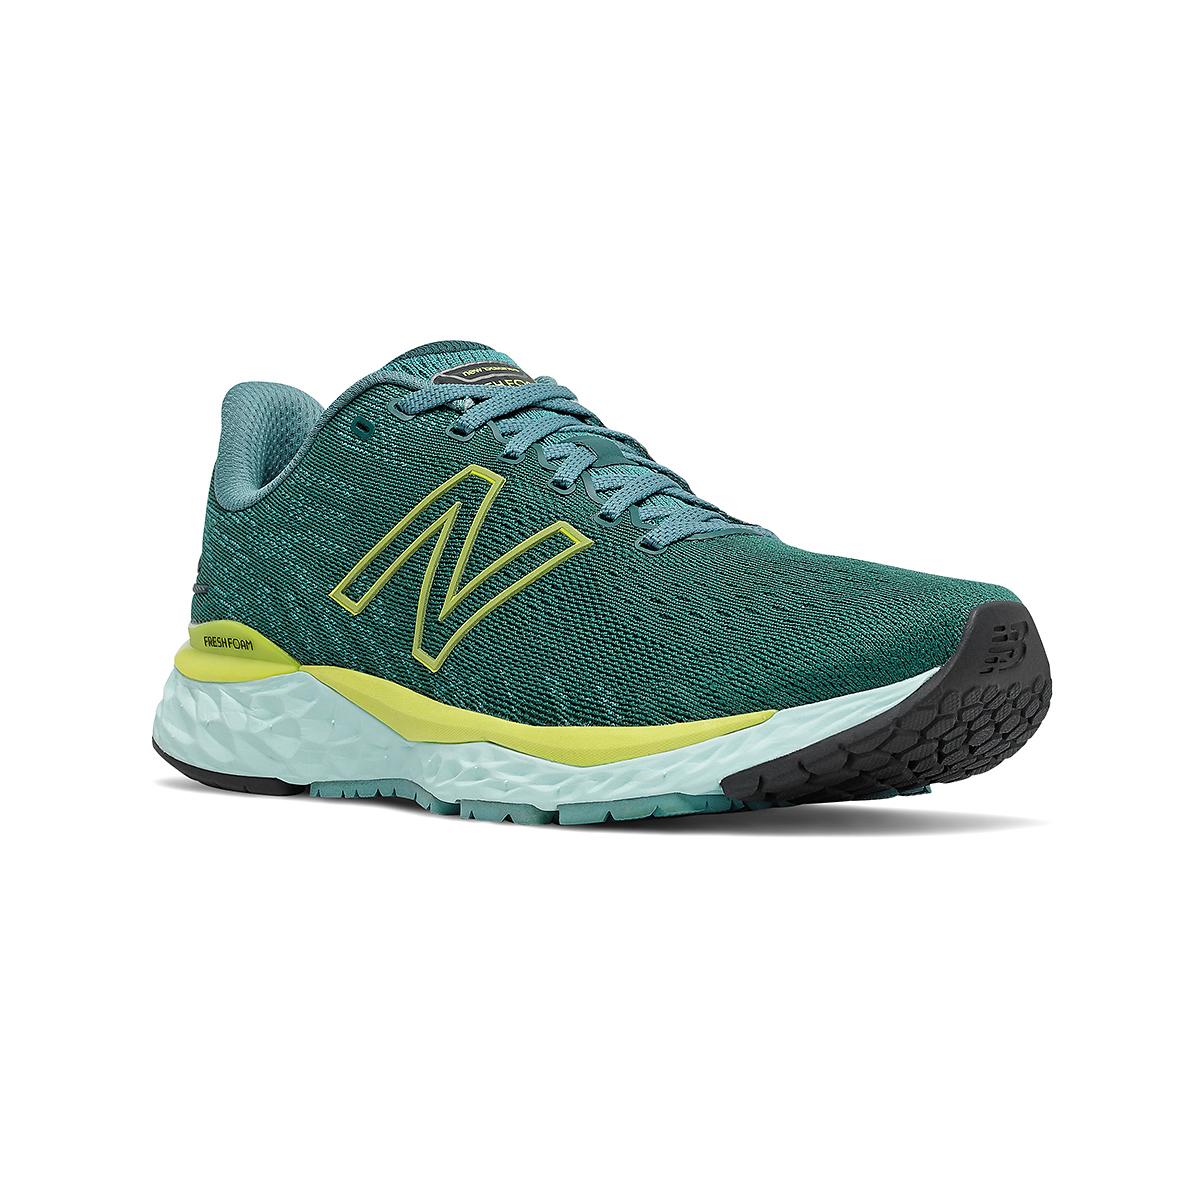 Men's New Balance Fresh Foam 880v11 Running Shoe - Color: Trek/Sulpher Yellow - Size: 7 - Width: Wide, Trek/Sulpher Yellow, large, image 3